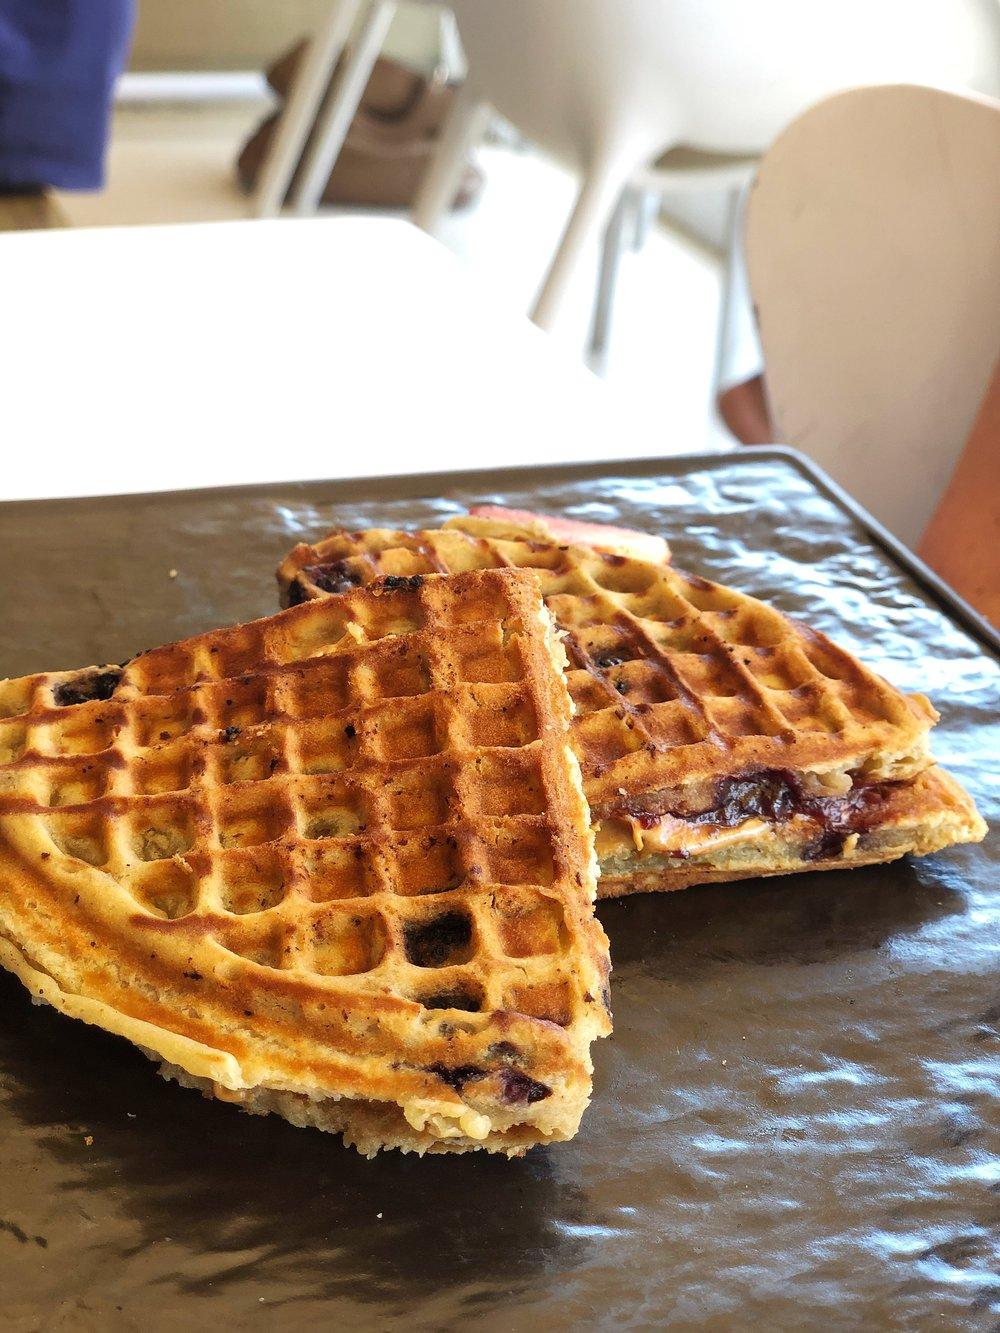 Peanut butter stuffed waffle